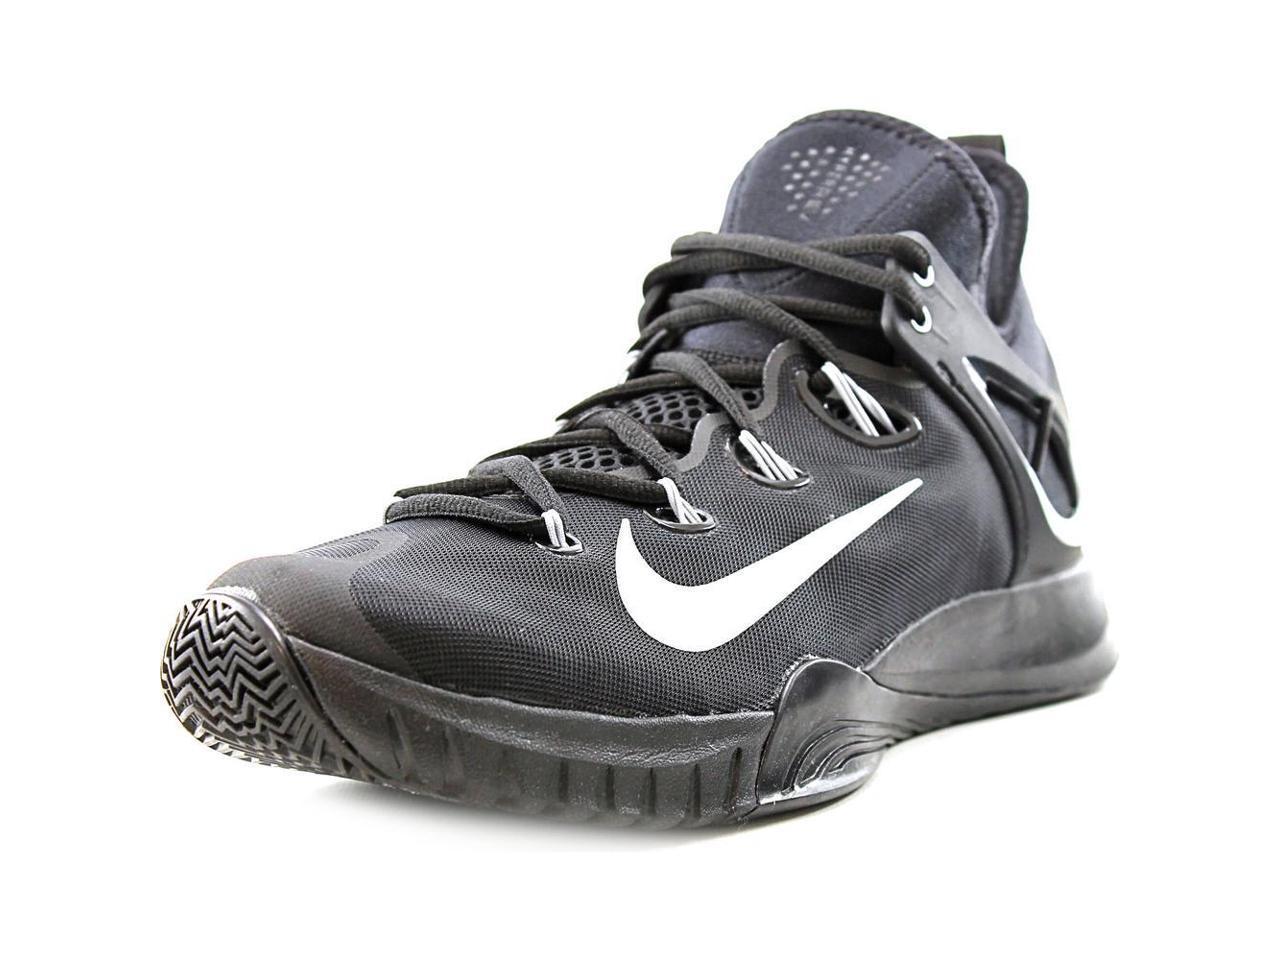 Nike Zoom 10 HyperRev 2015 Men US 10 Zoom Black Basketball Shoe 099574